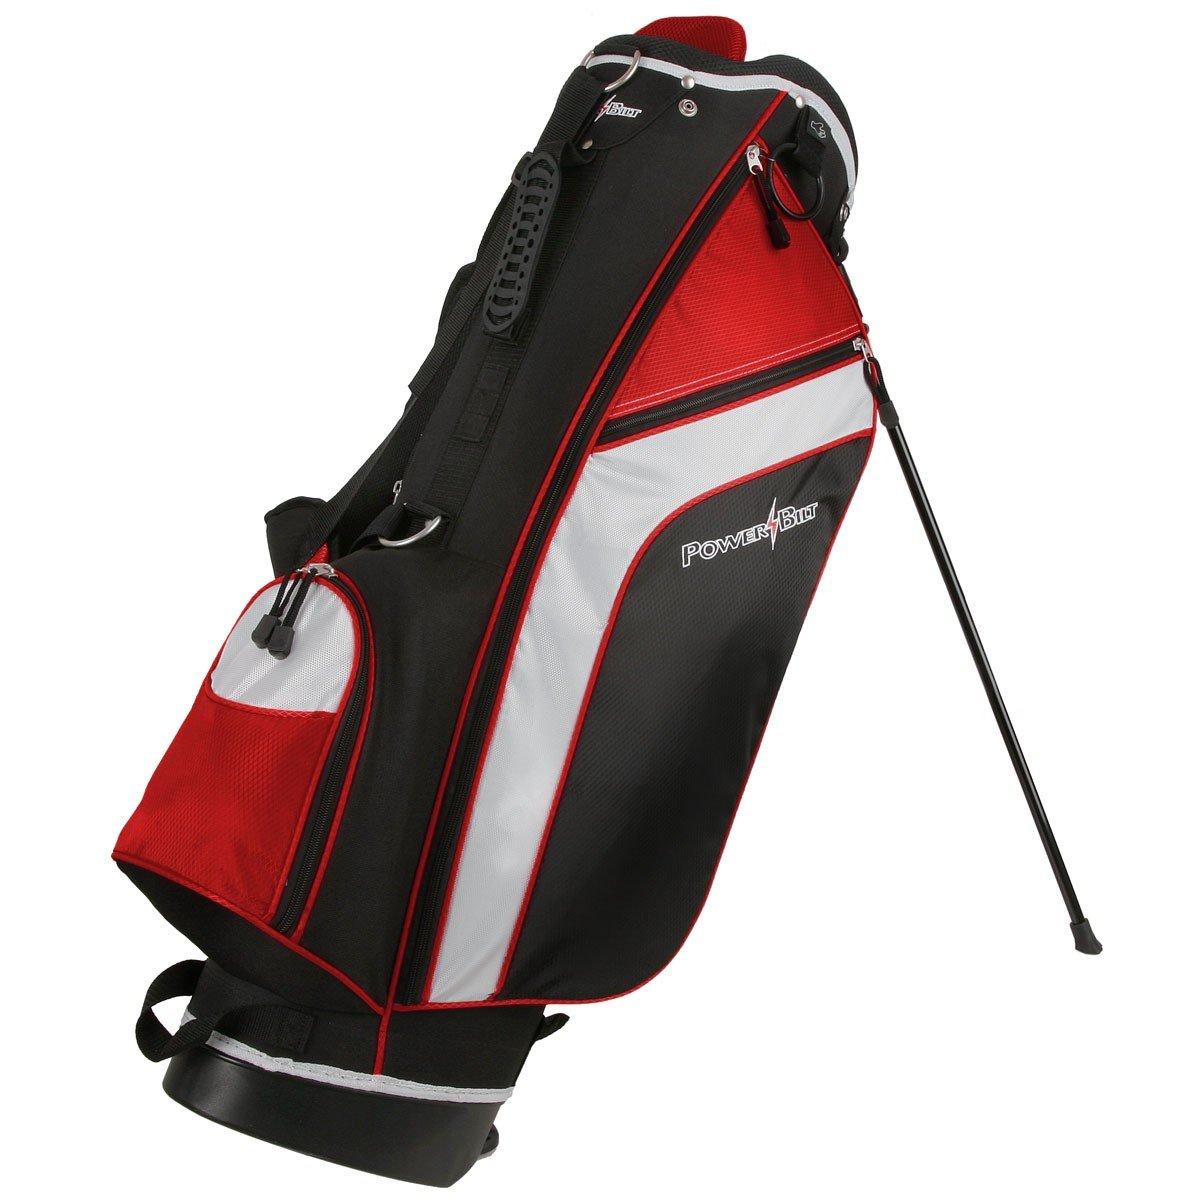 PowerBilt Santa Rosa Black/Red Stand Golf Bag (Black/Red)